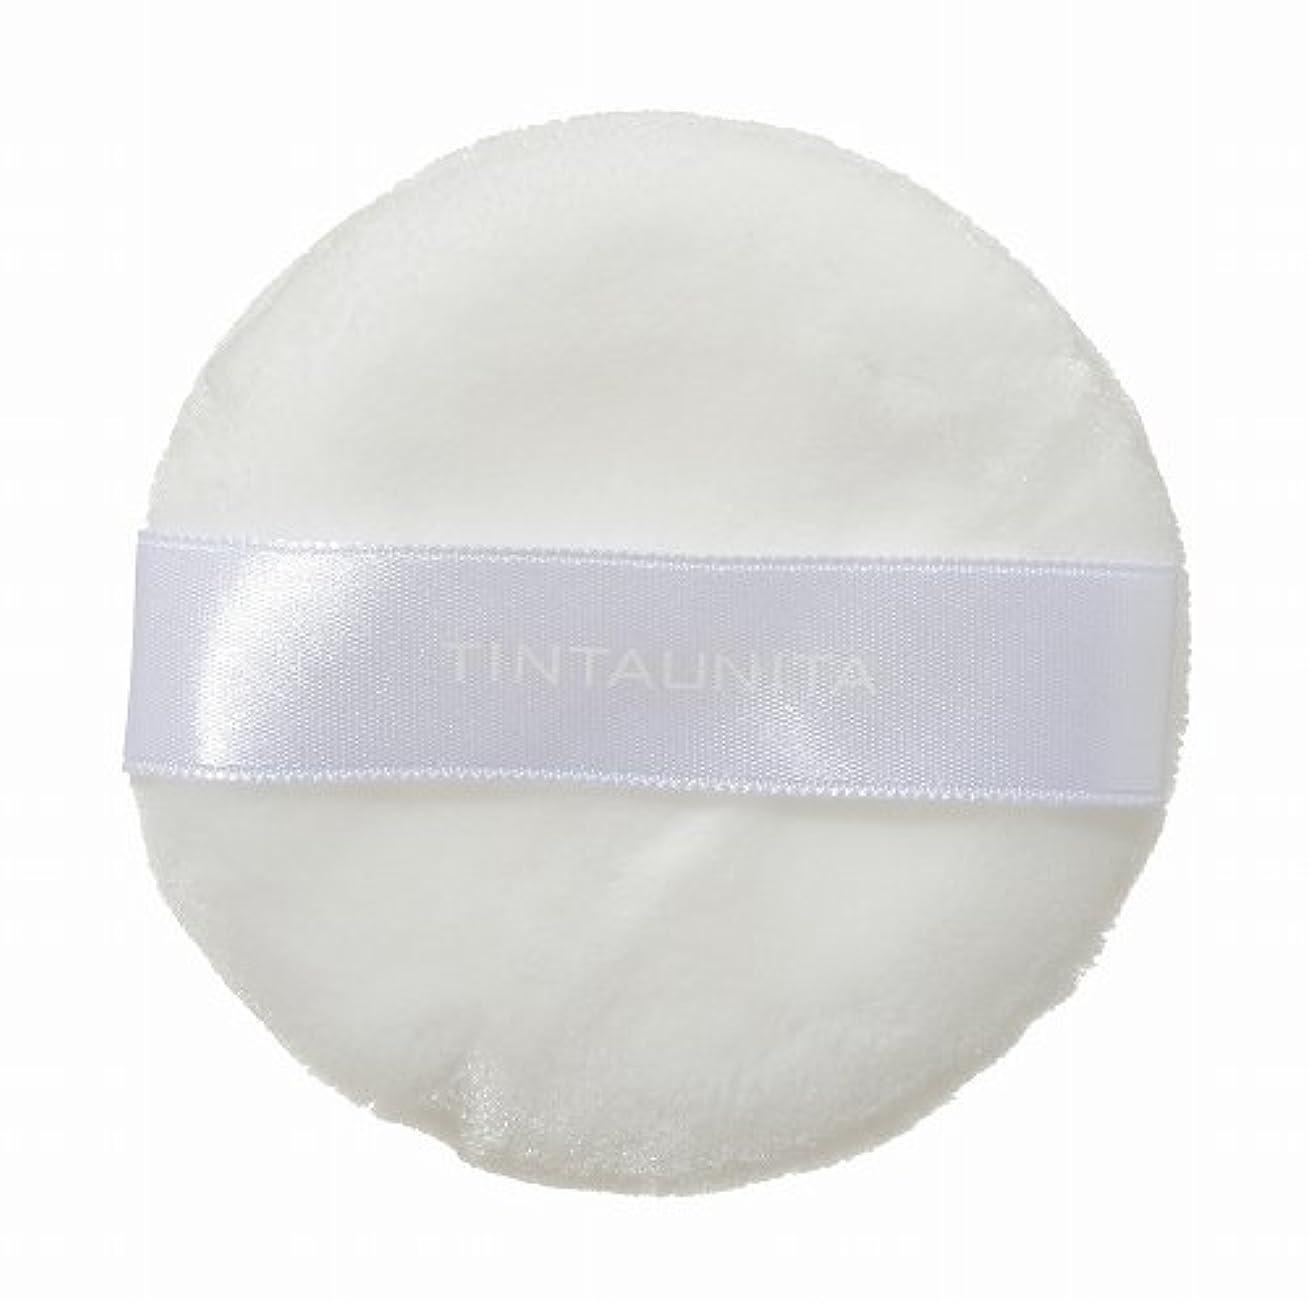 TINTAUNITA 4.5mmロングパイル パウダーパフ(日本製)